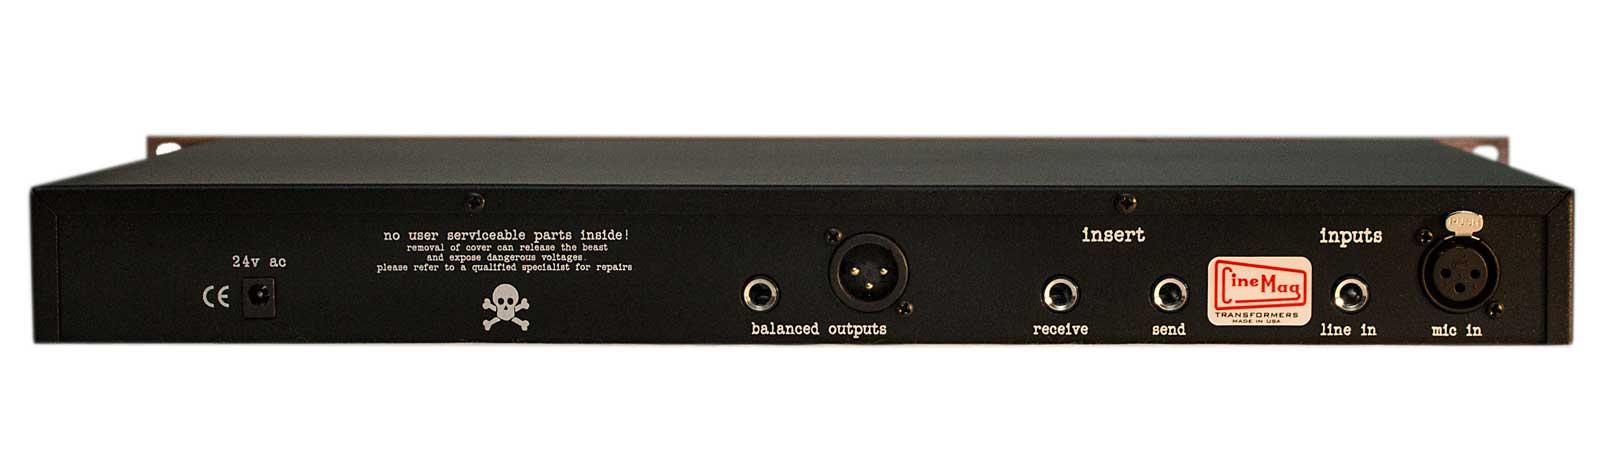 warm audio tb12 tone beast mic pre mikrofon preamp mydukkan. Black Bedroom Furniture Sets. Home Design Ideas